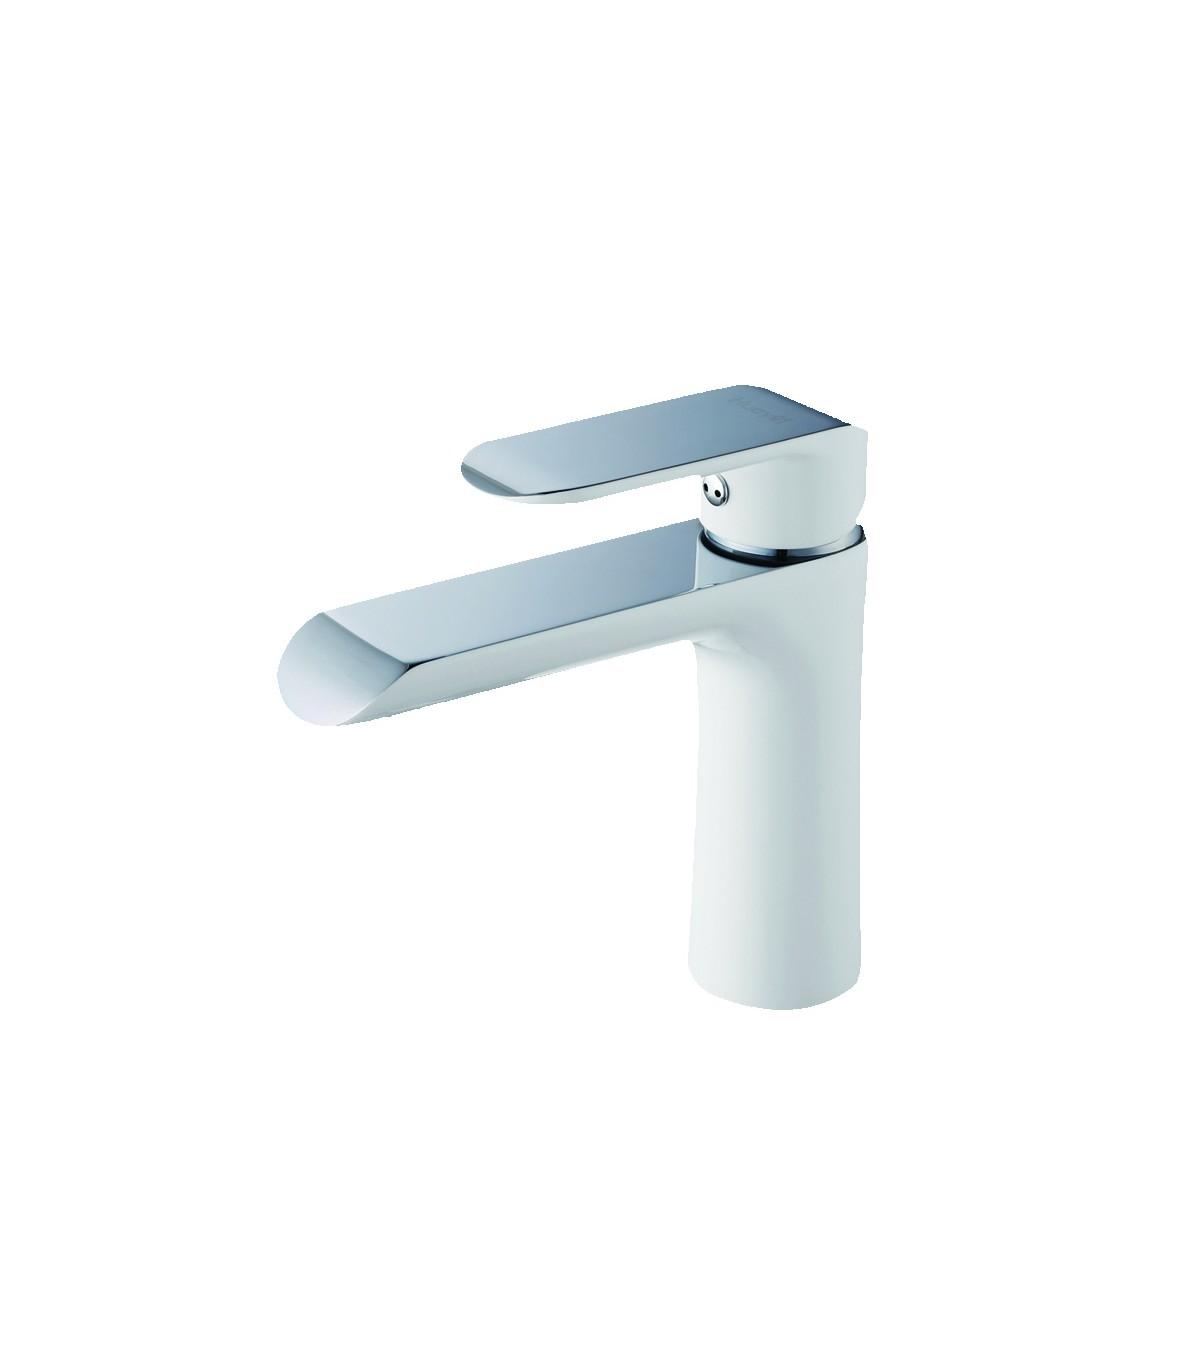 LS-BF1 Bathroom Faucet Chrome White